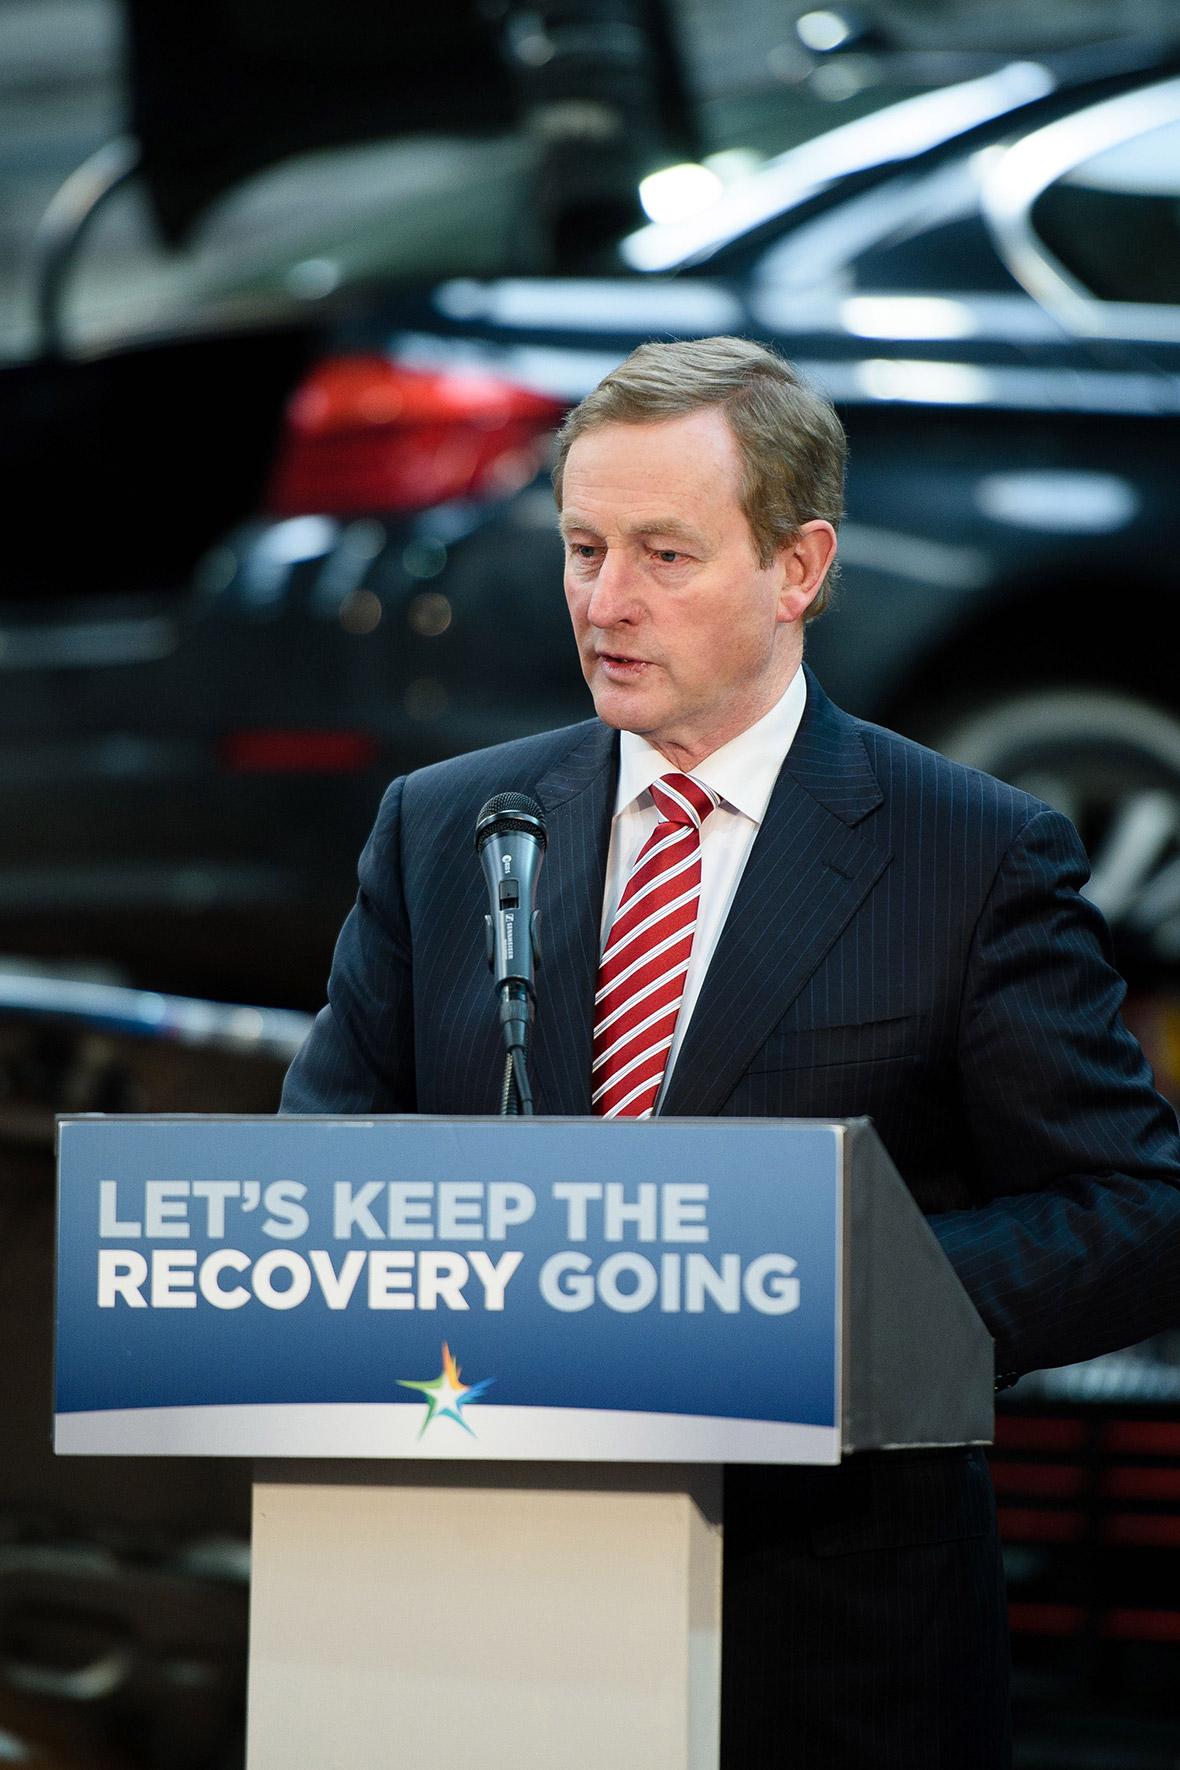 Ireland election 2016